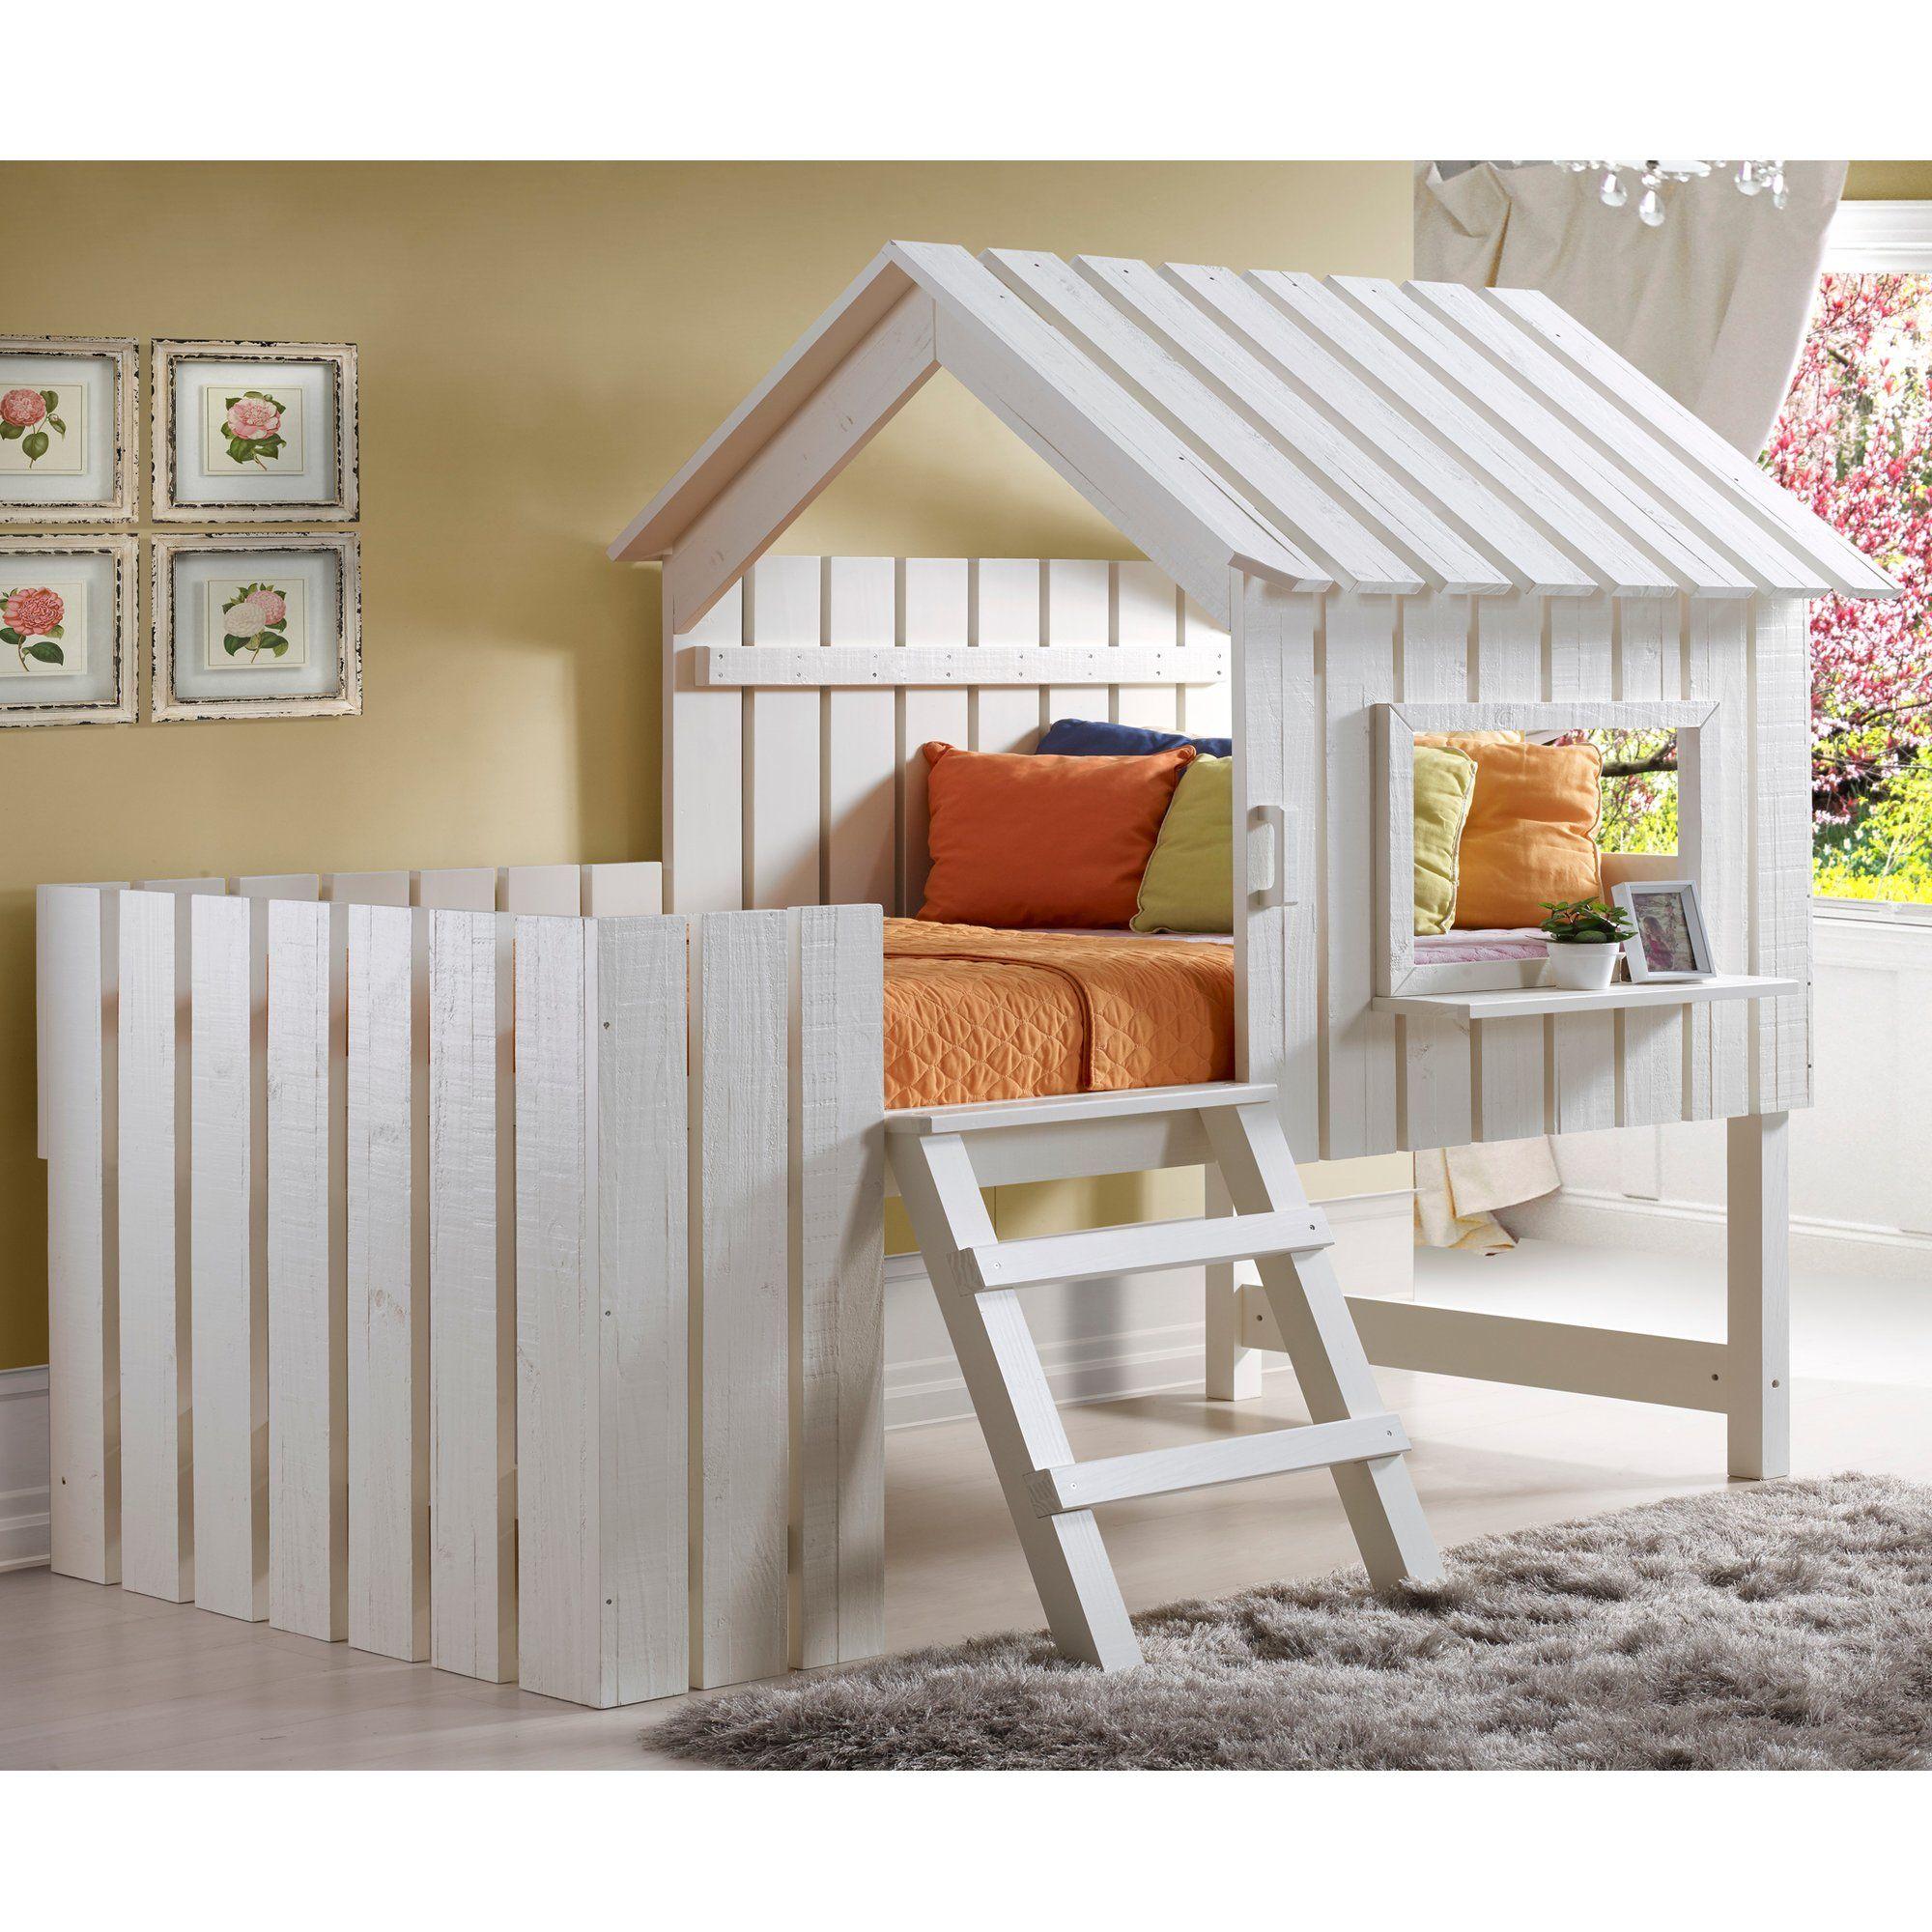 Kids low loft bed  Cabana Twin Low Loft Bed  Blasto  Pinterest  Low loft beds